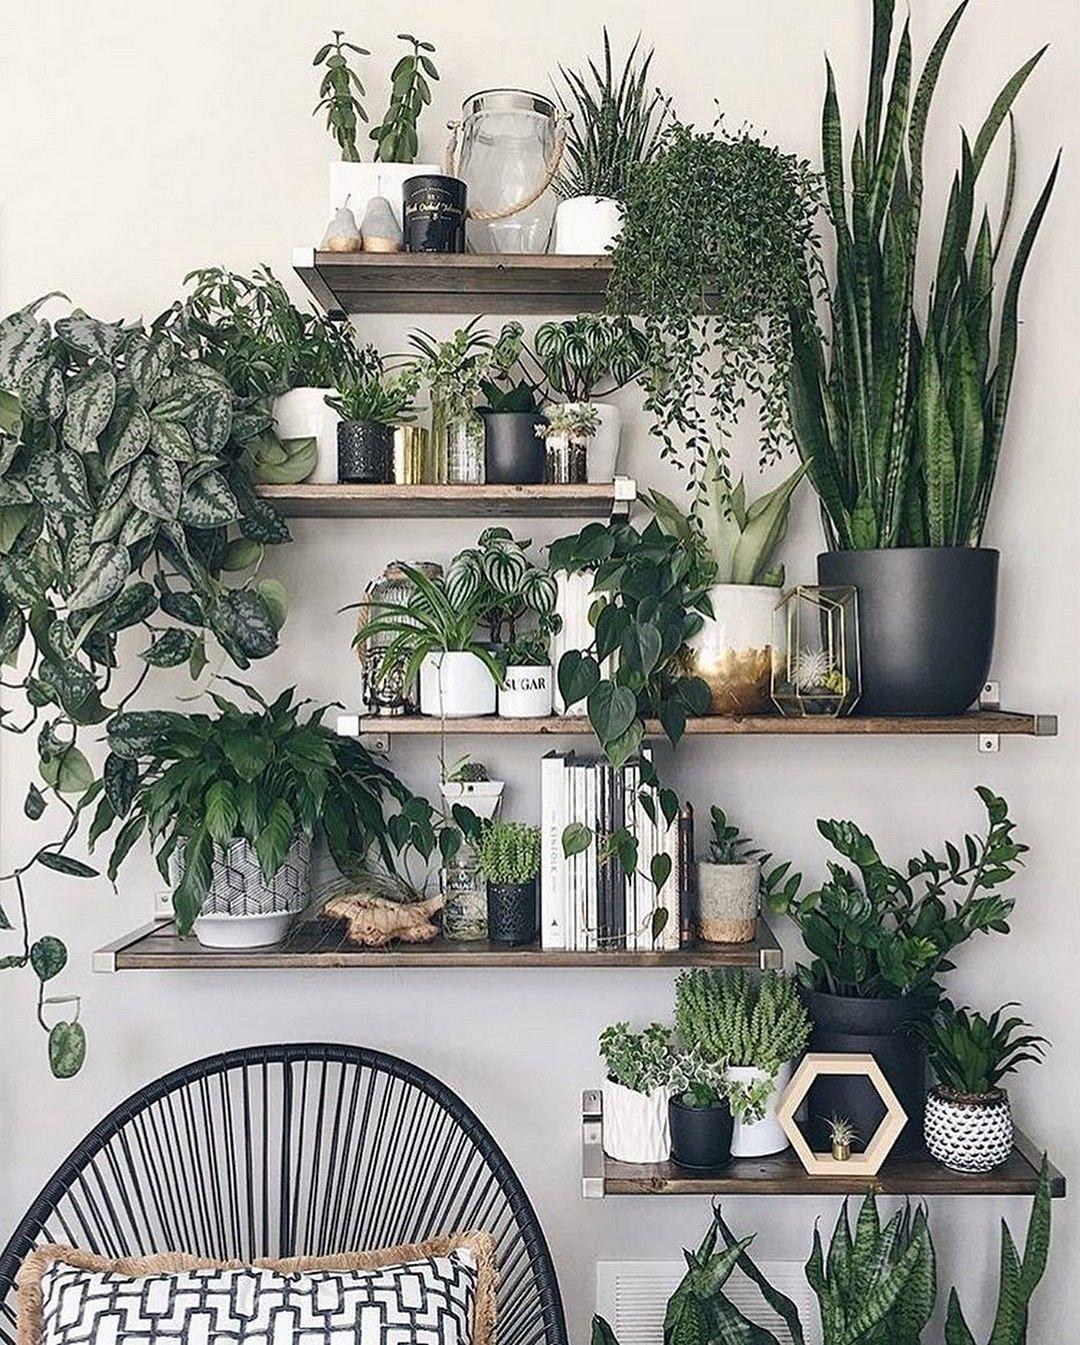 DIY Plans Shelf Ideas